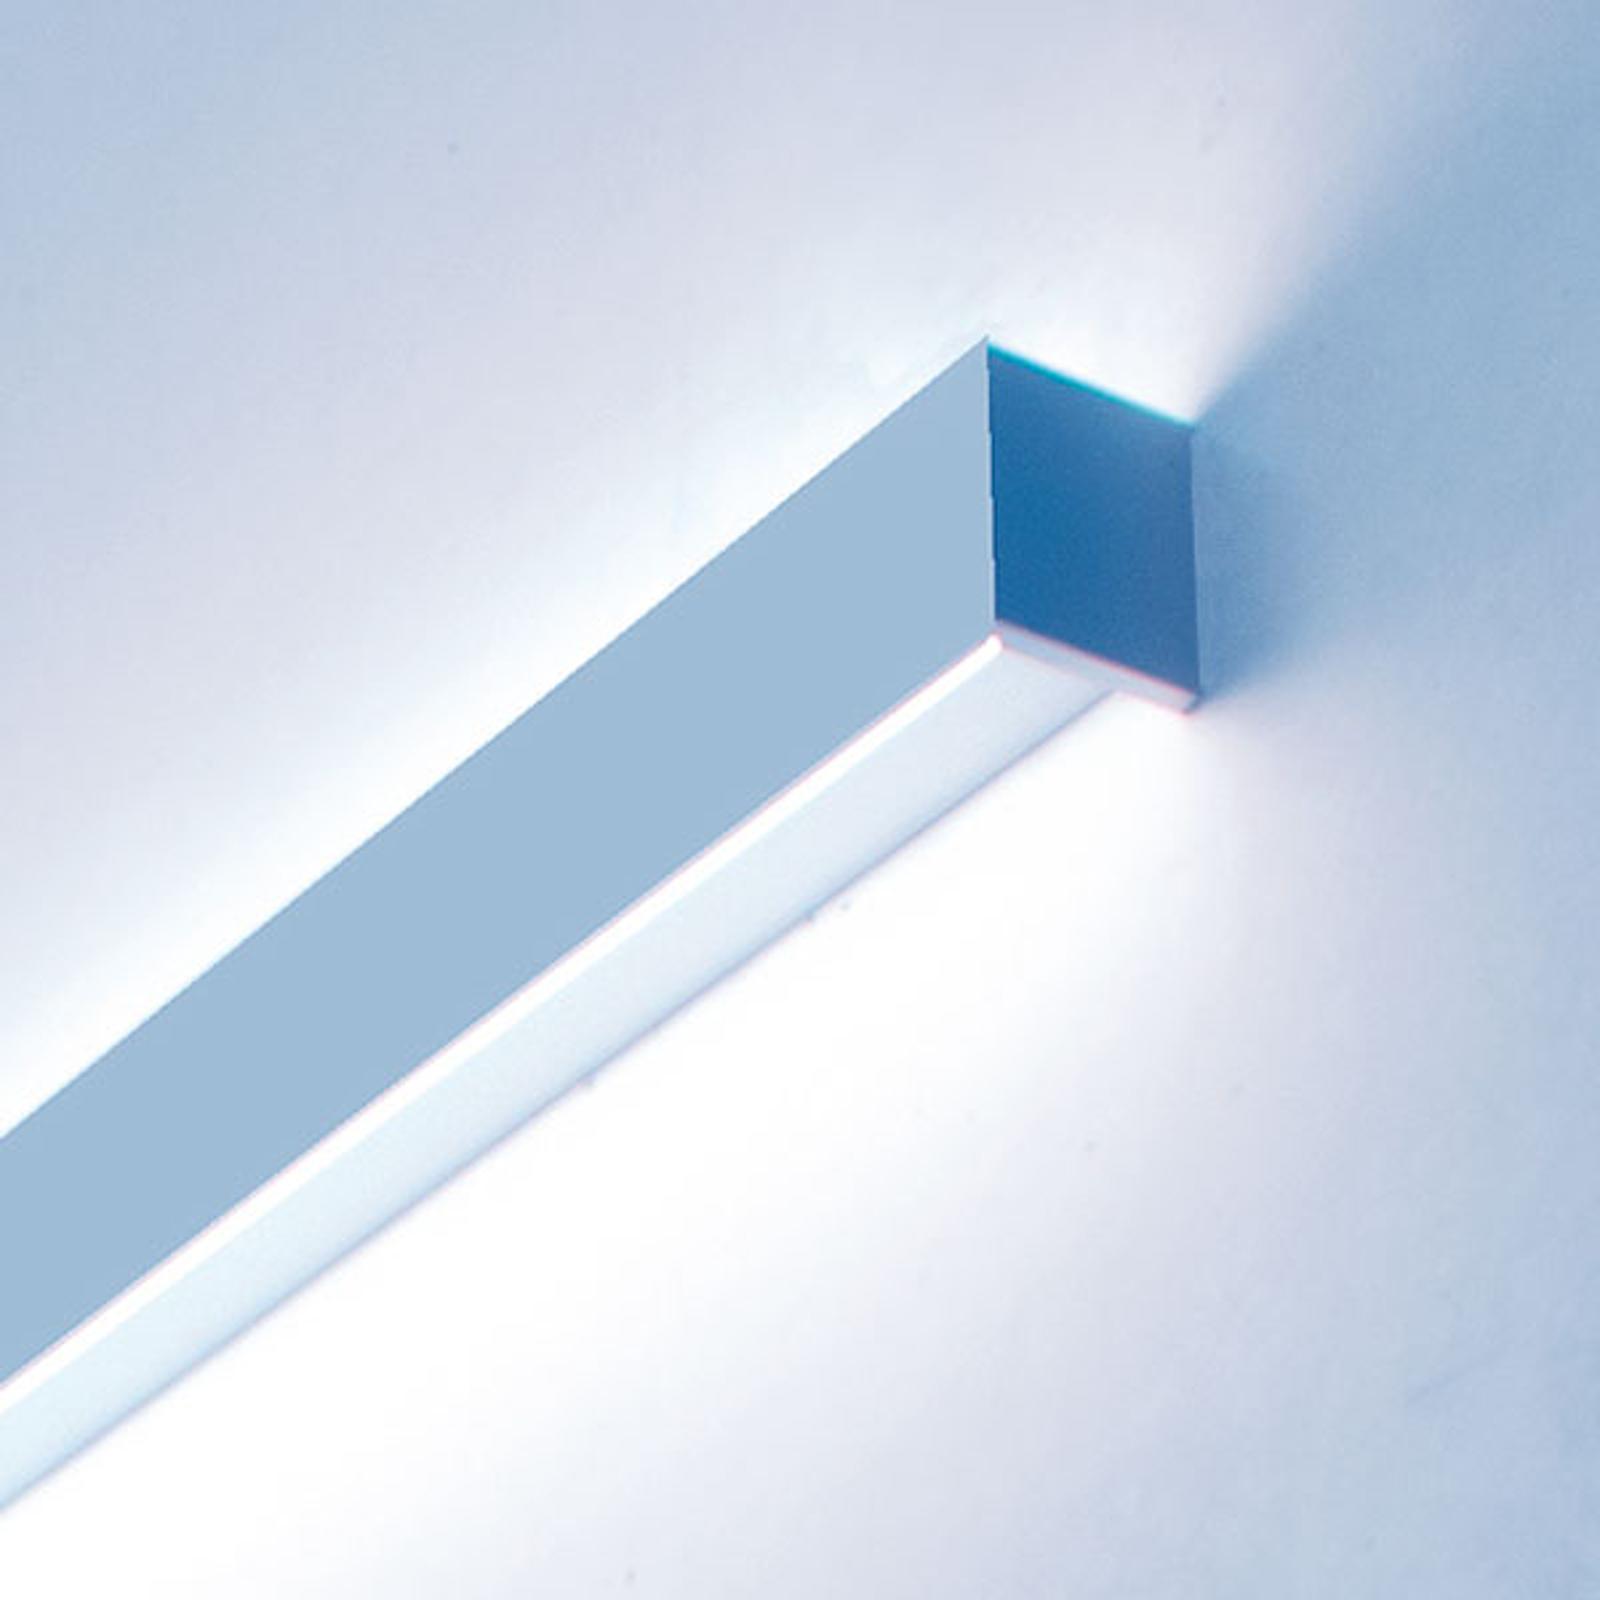 Matric W1 LED-vegglampe i 177 cm, 3000 K